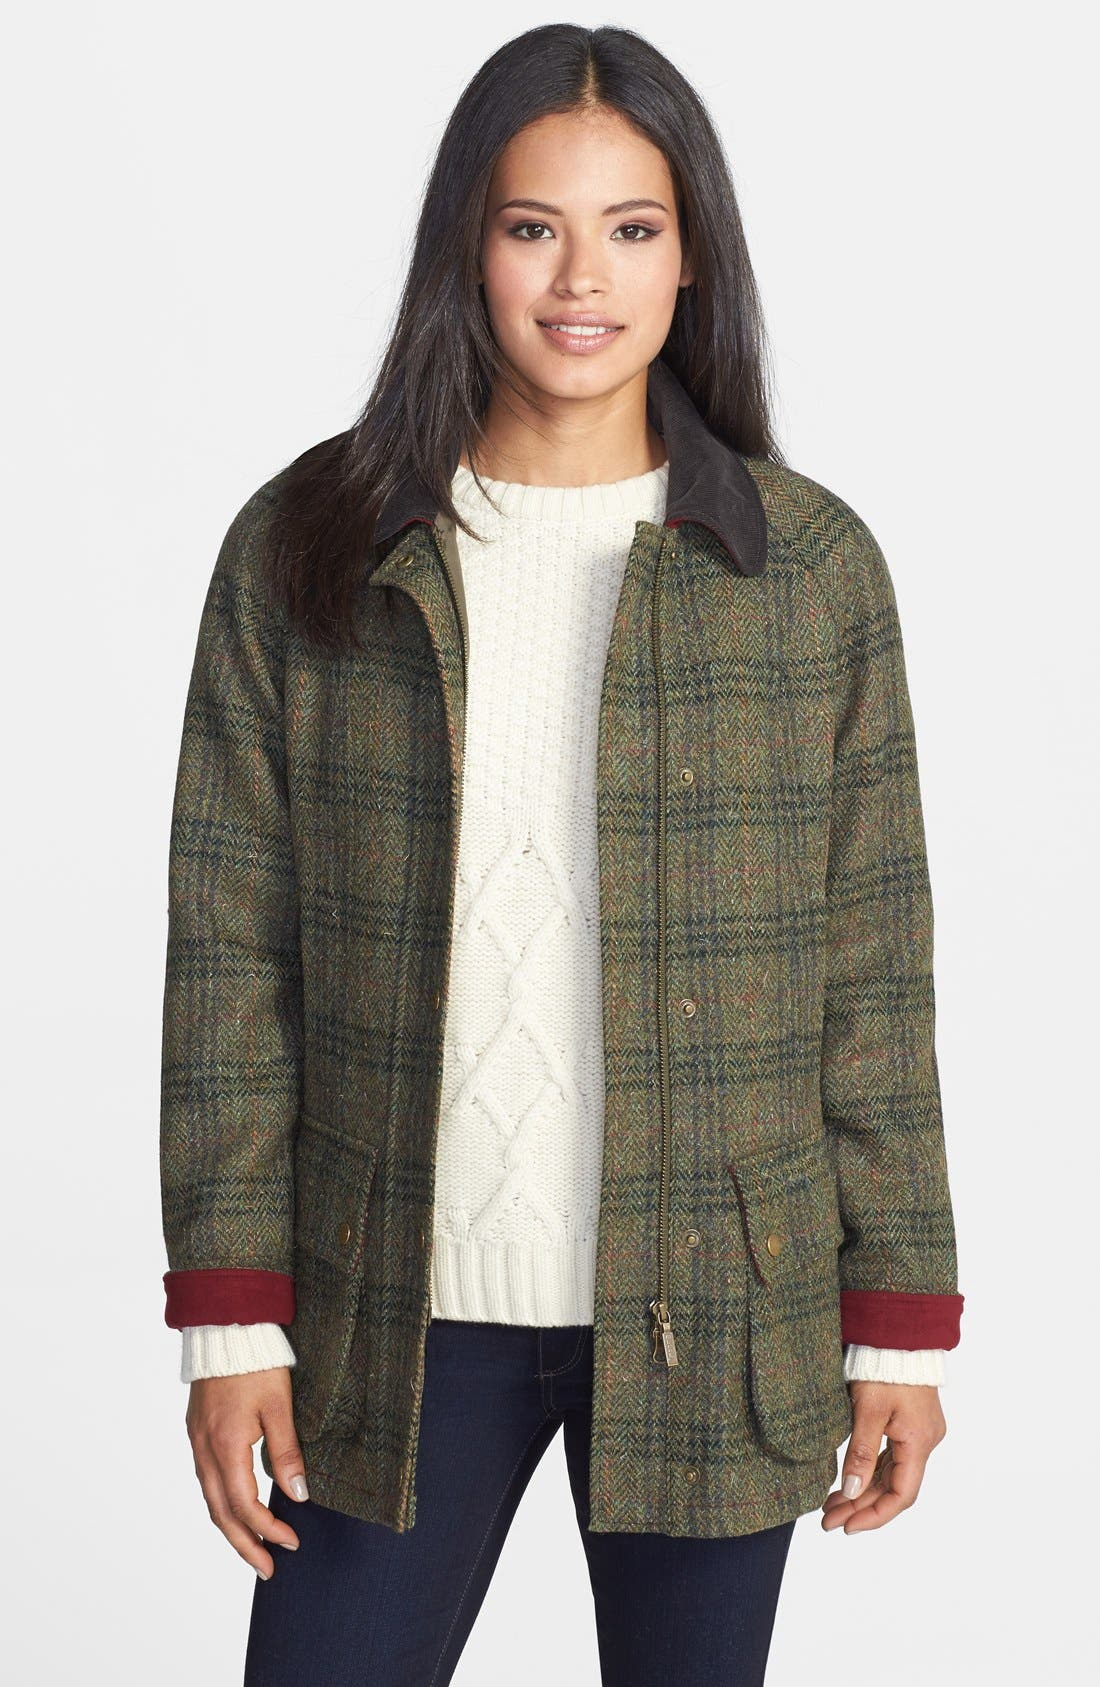 Alternate Image 1 Selected - Barbour 'Beadnell - Edworth Tweed' Plaid Wool Coat